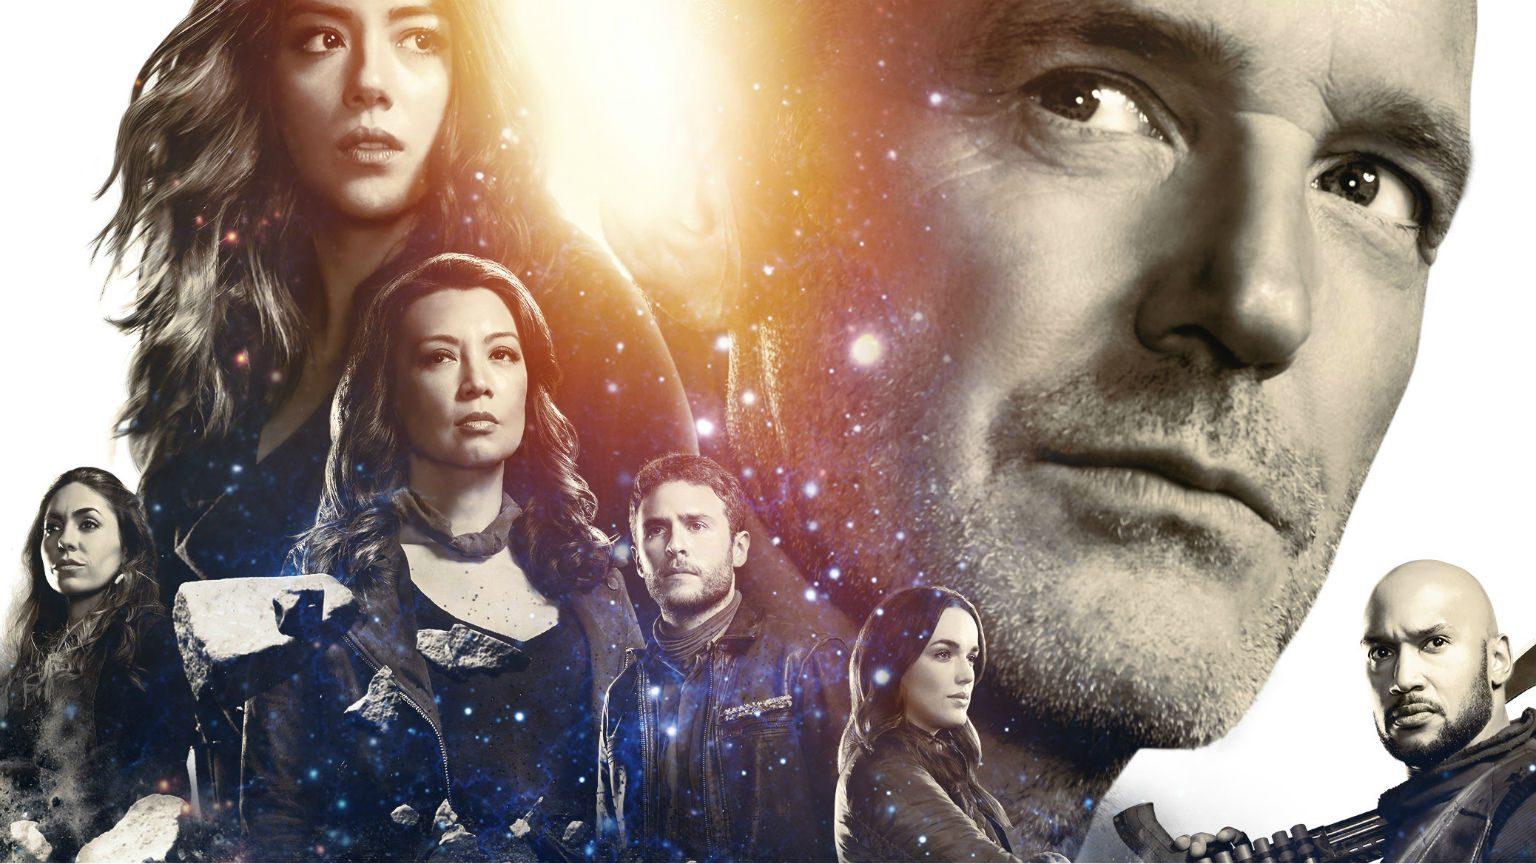 Agents of S.H.I.E.L.D characters